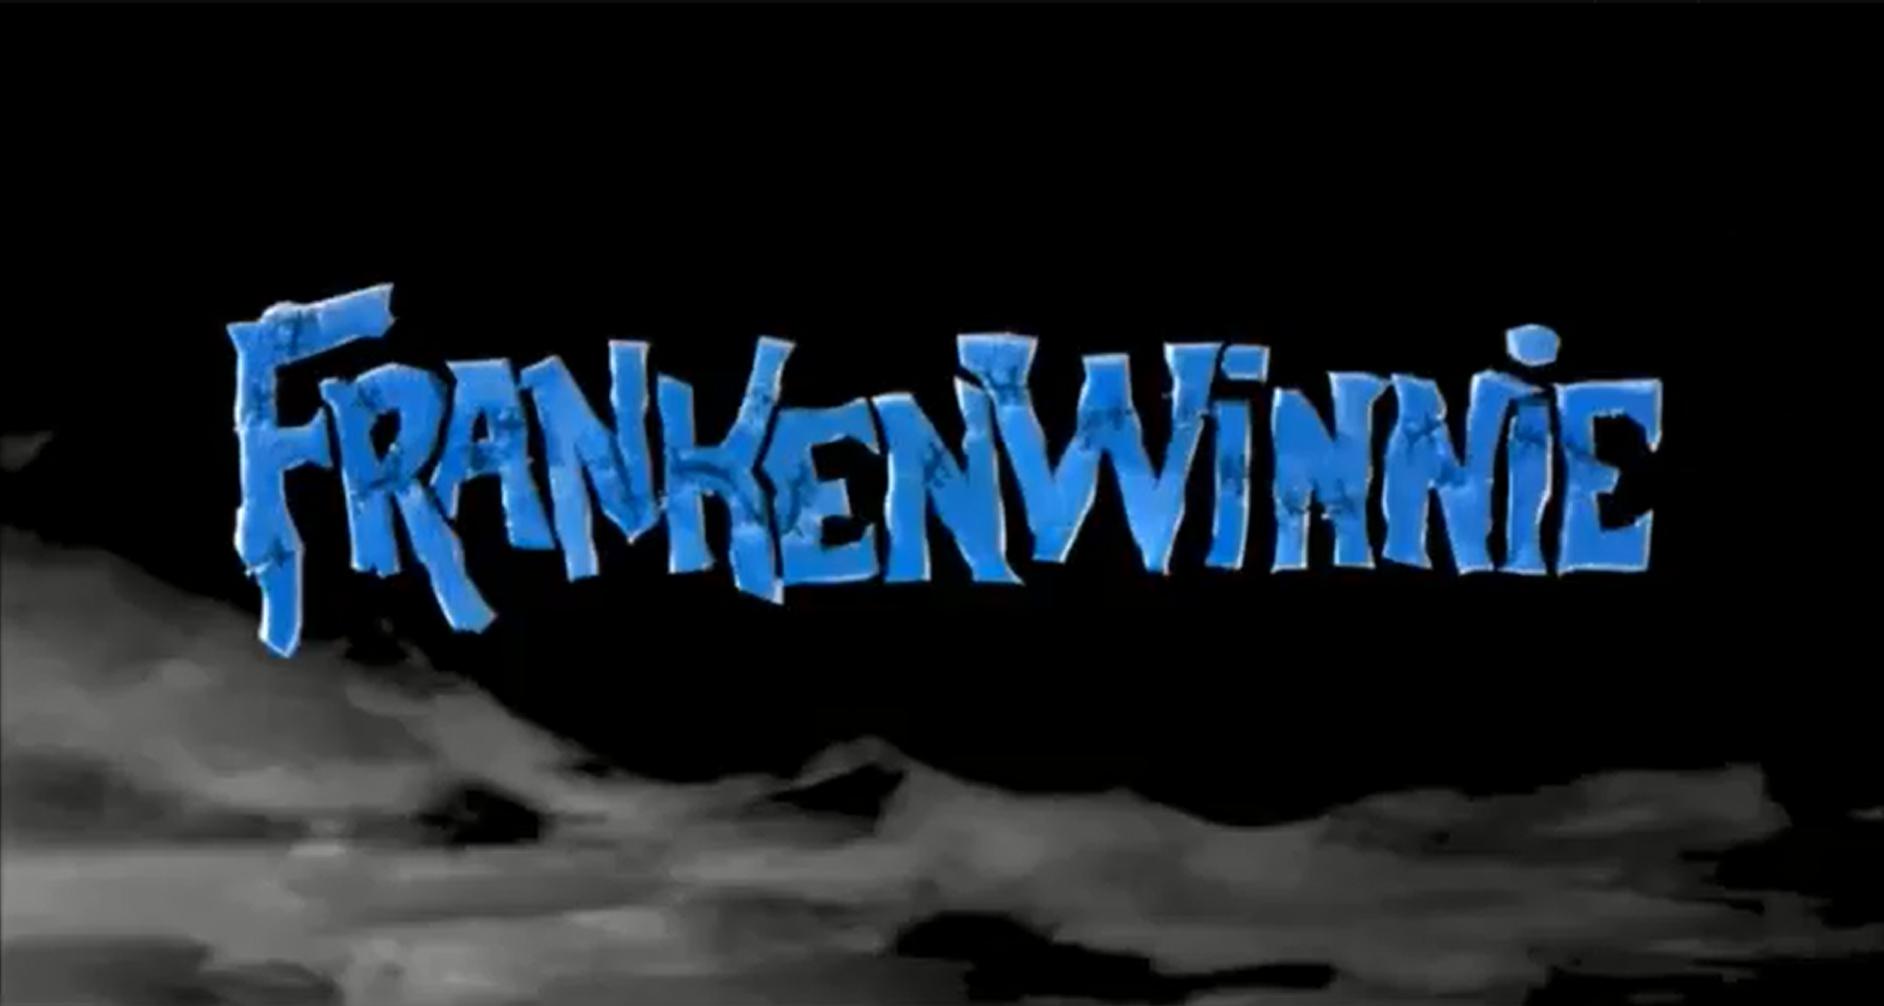 Frankenwinnie on Random Number Cartoon